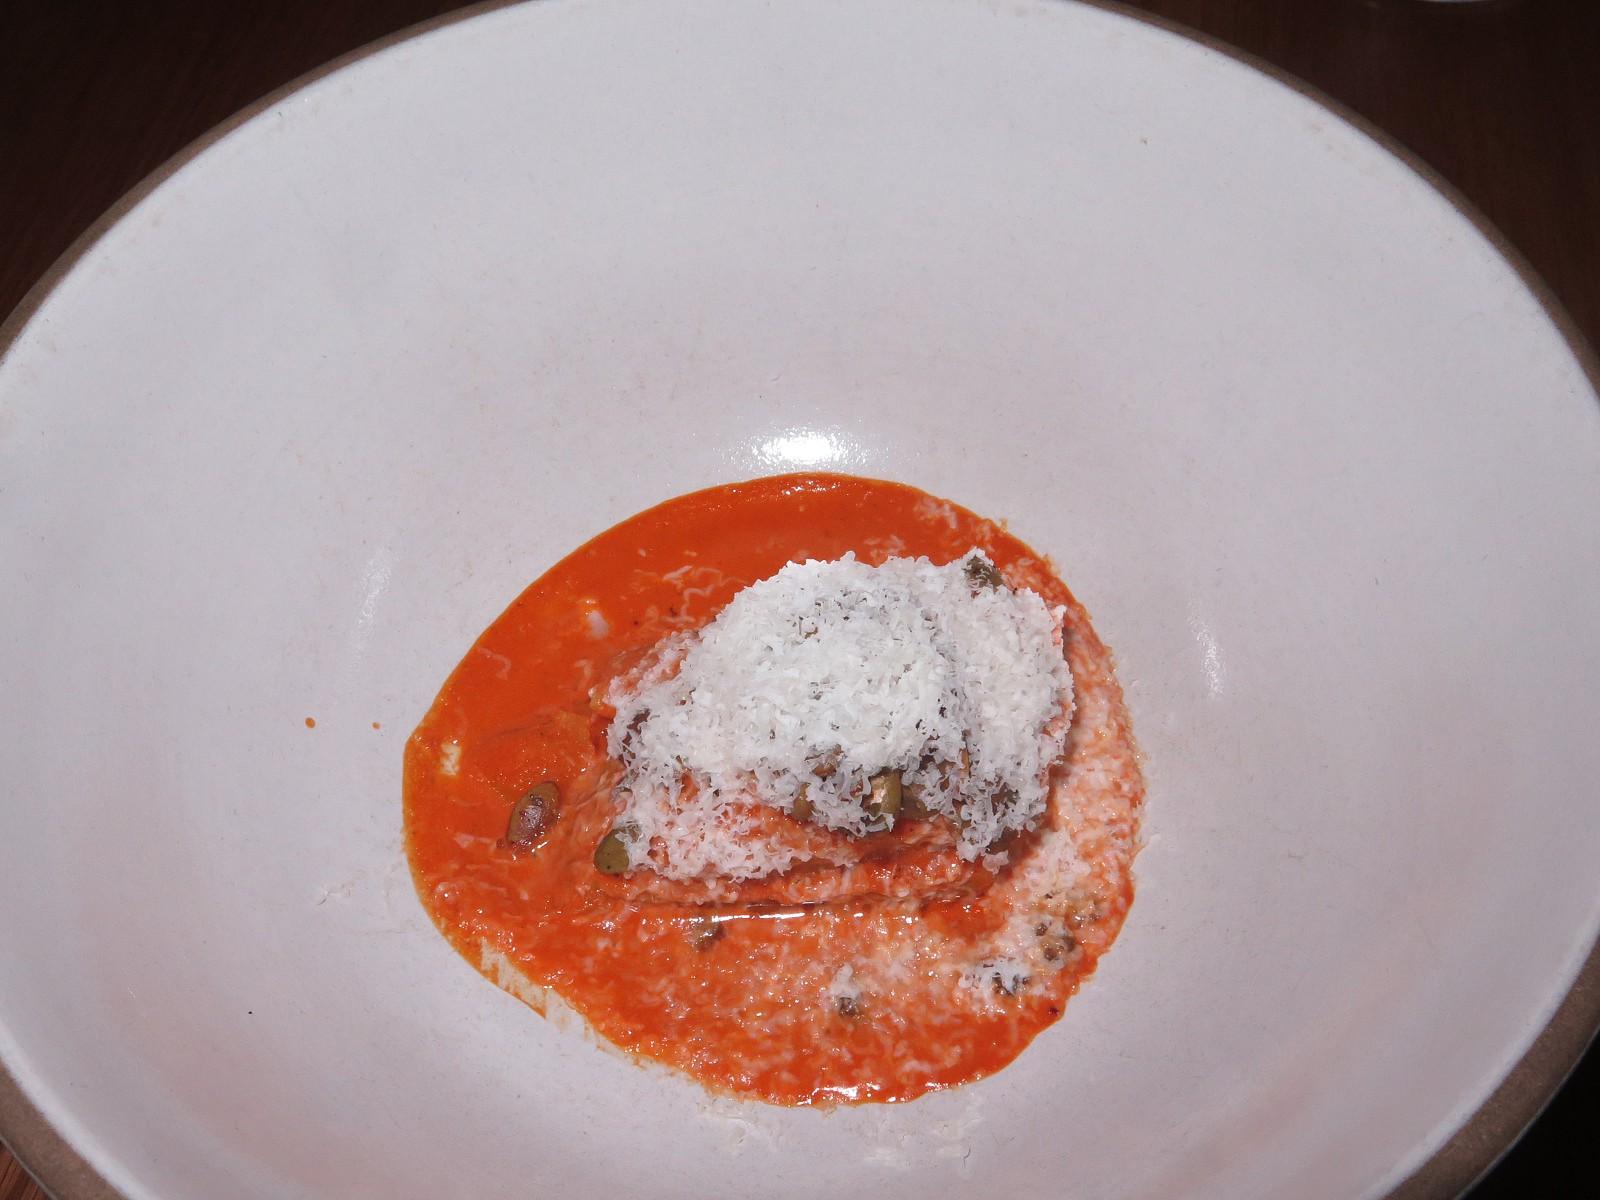 Honeynut squash tamal, ha'sikil p'ak, castelrosso